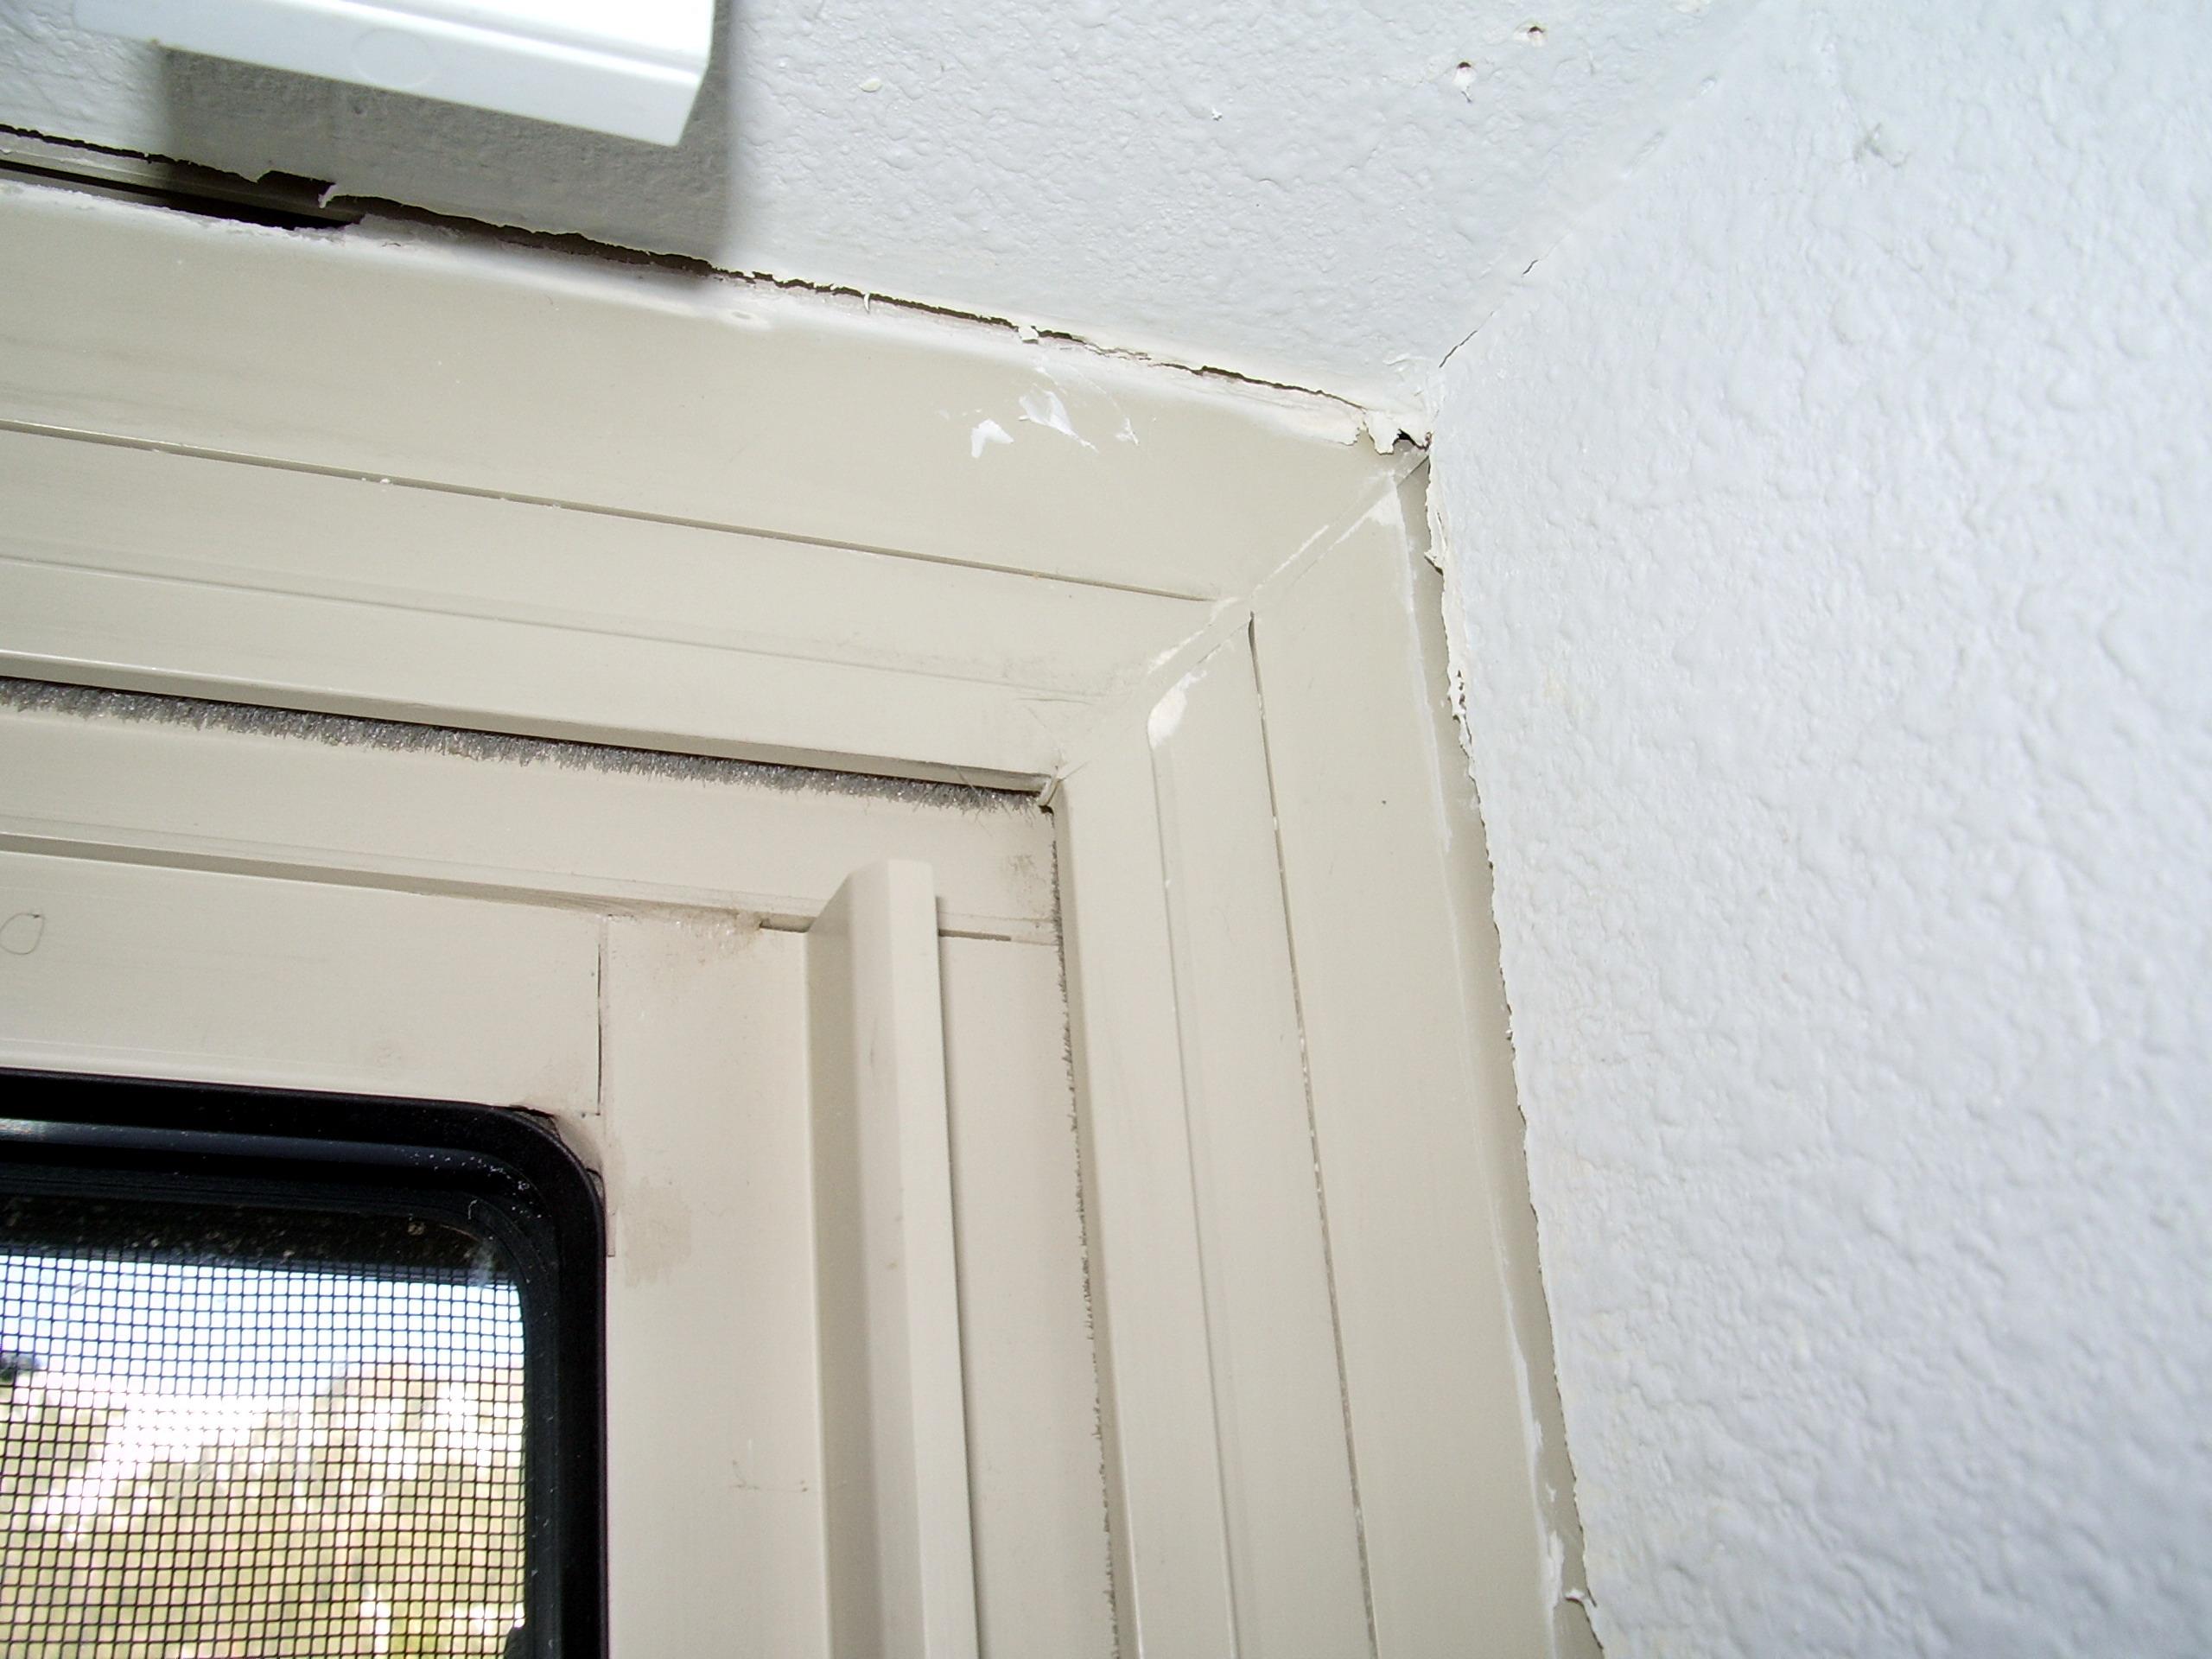 How to Recaulk Window Panes